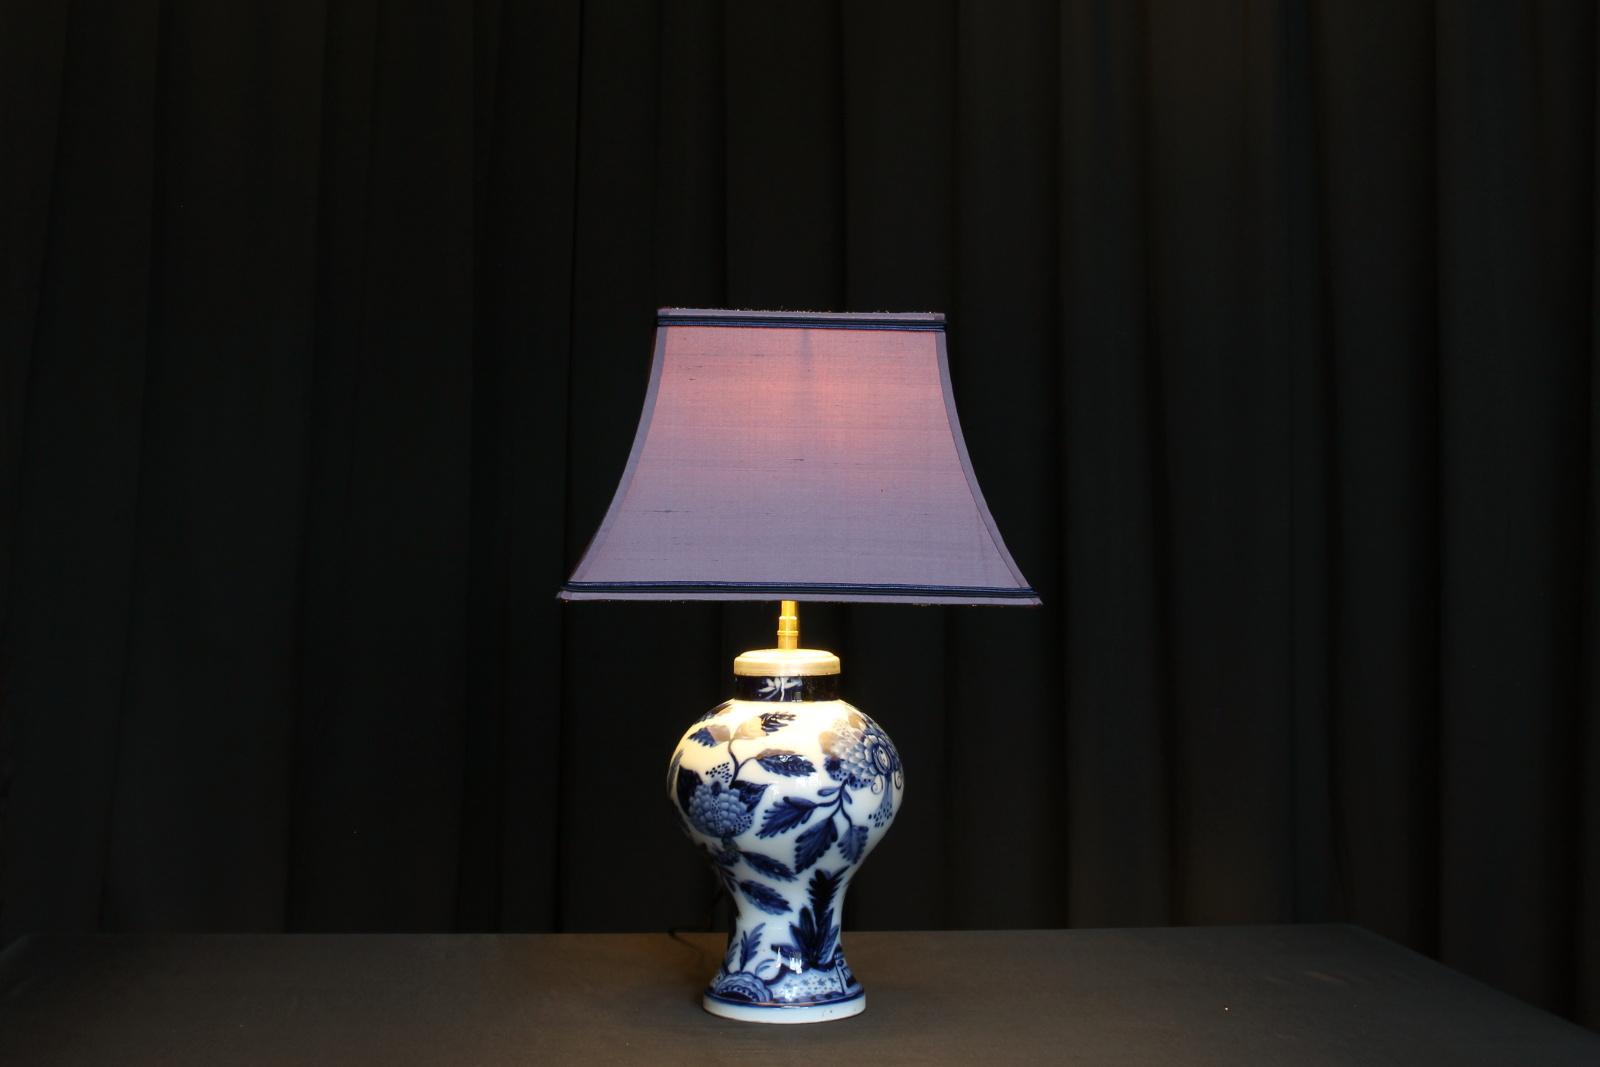 abat jour pagode soie apres allume m tissage mati res. Black Bedroom Furniture Sets. Home Design Ideas